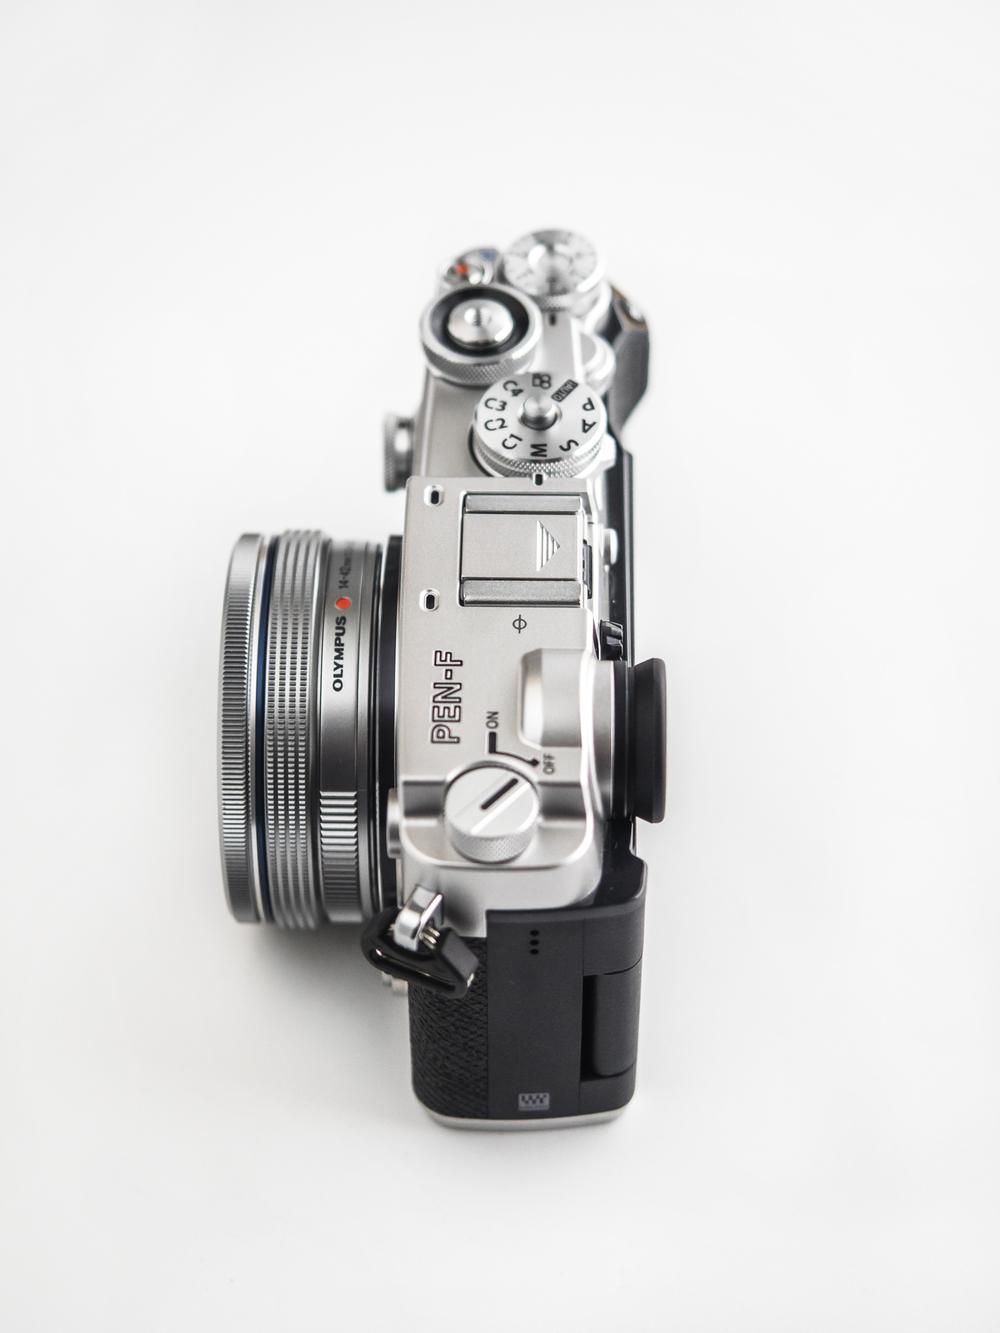 P1140340.jpg